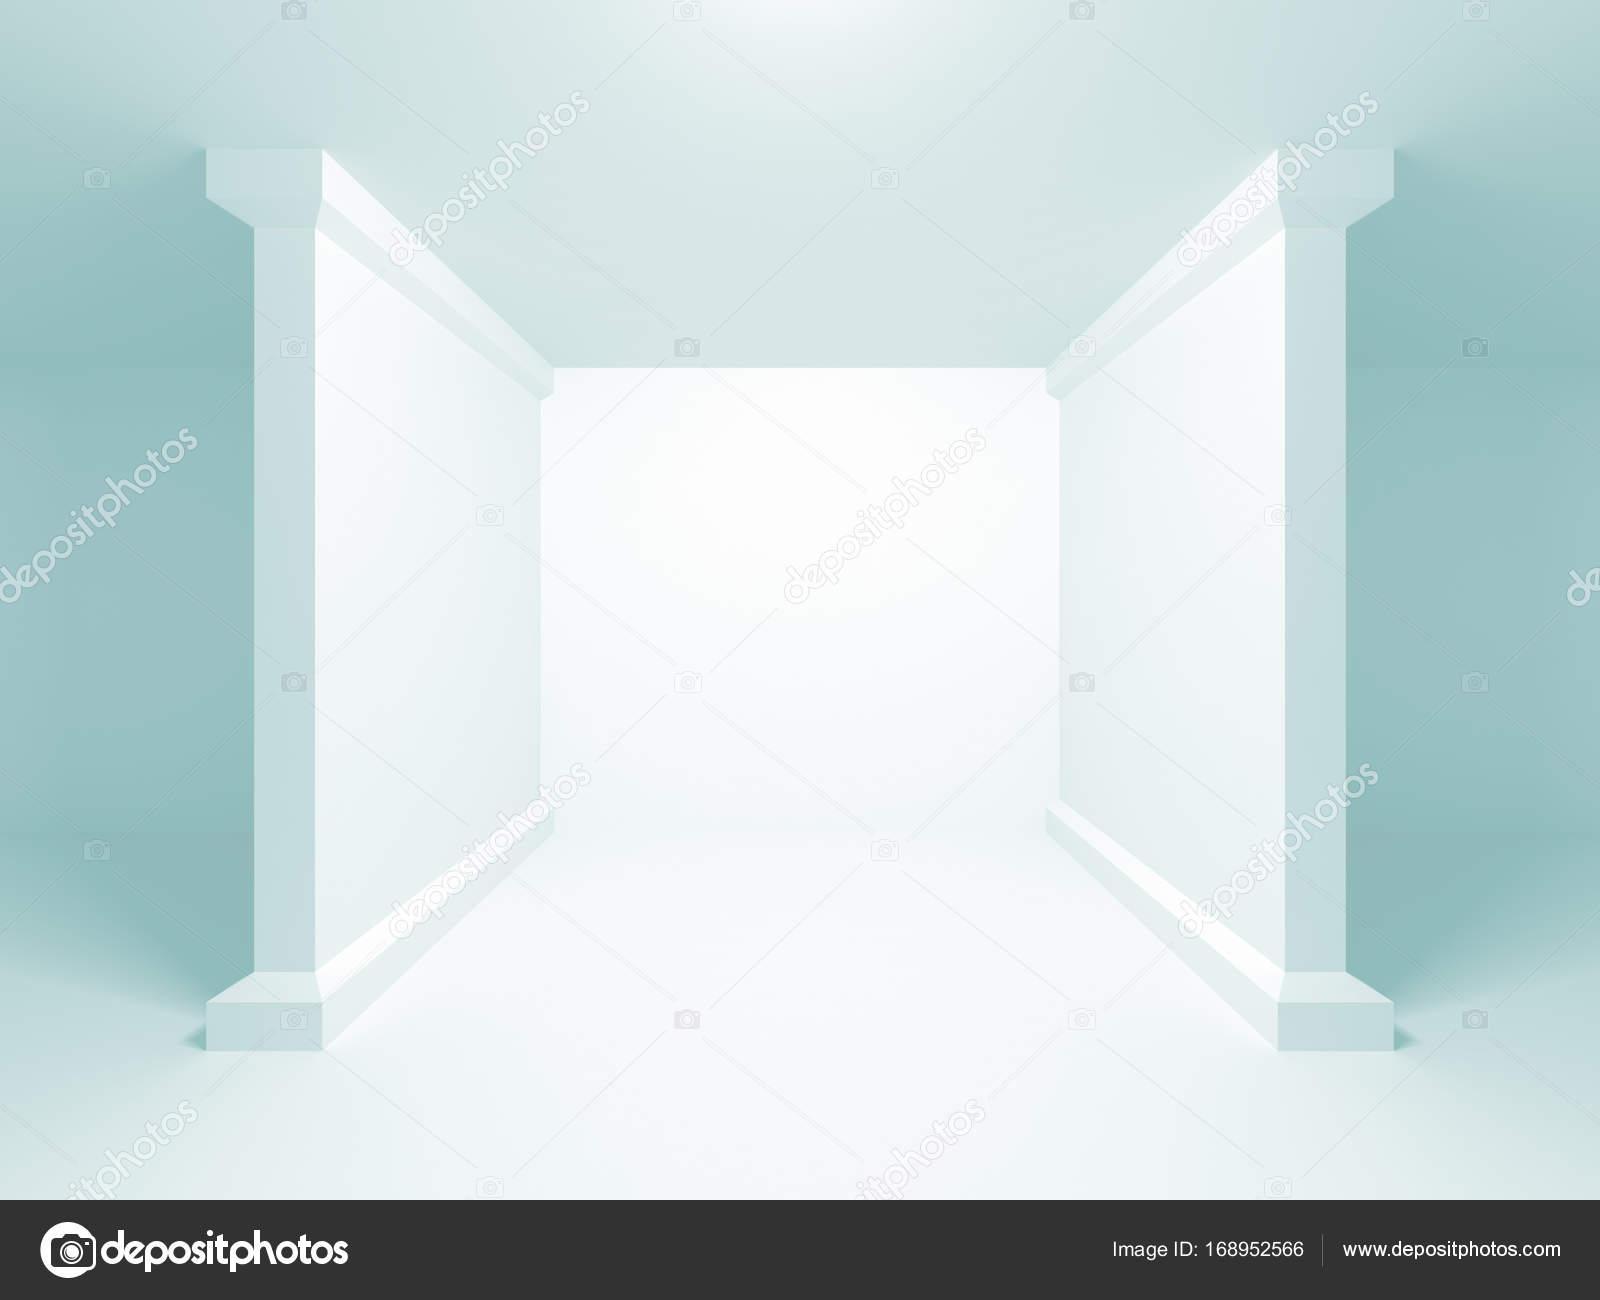 Arredamento moderno bianco costruzione u2014 foto stock © versusstudio